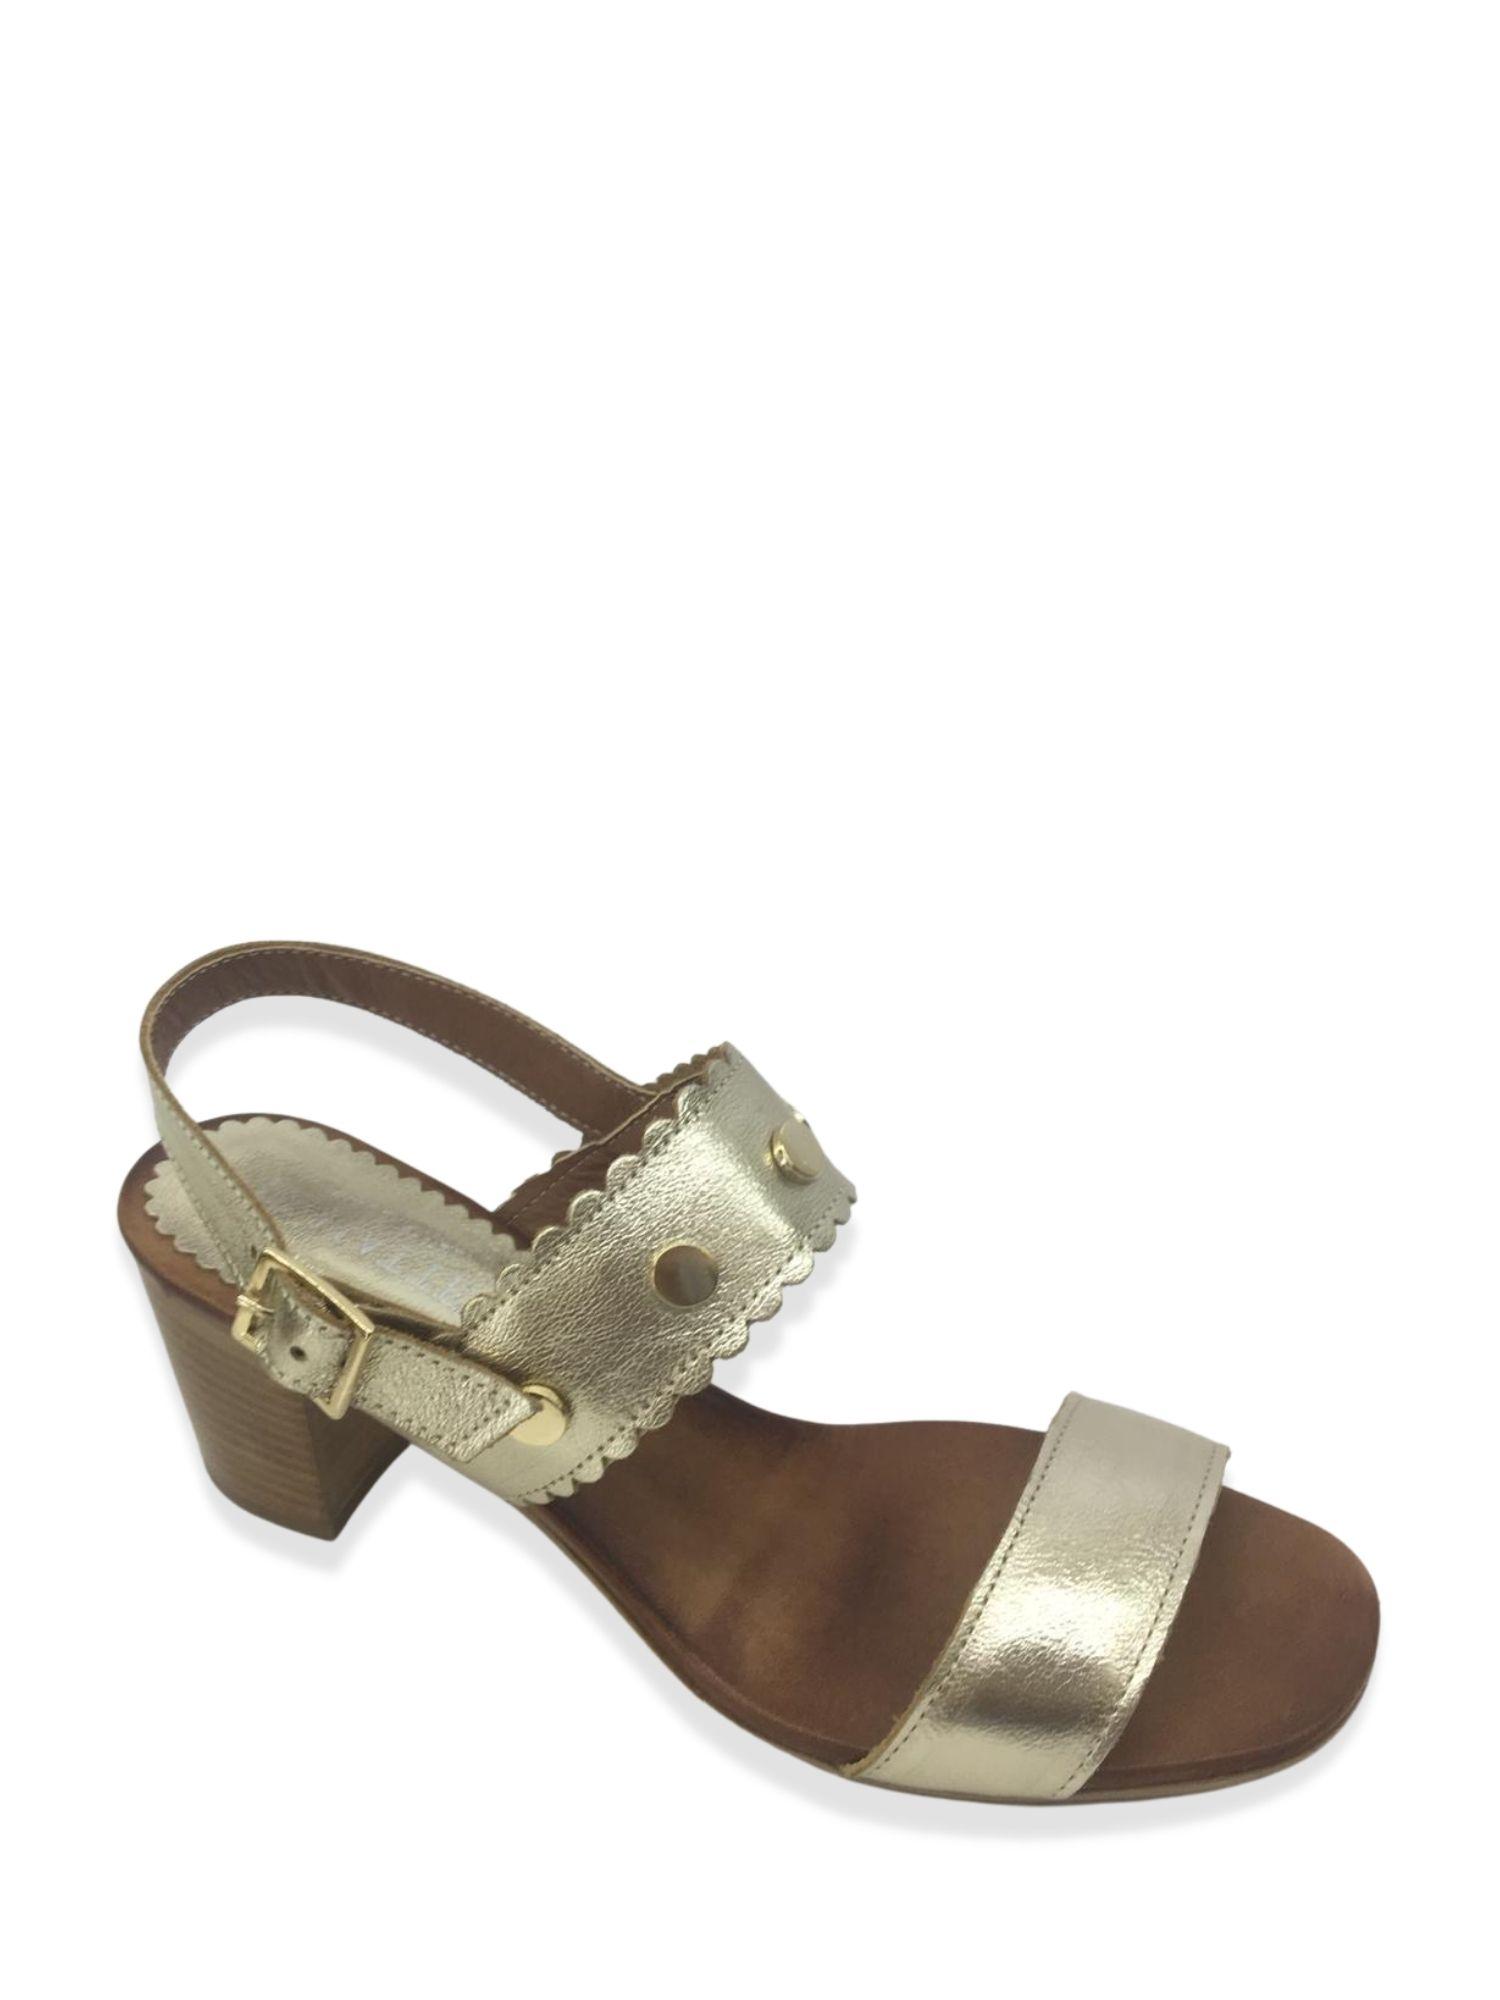 Sandalo Made in Italy 101 Platino